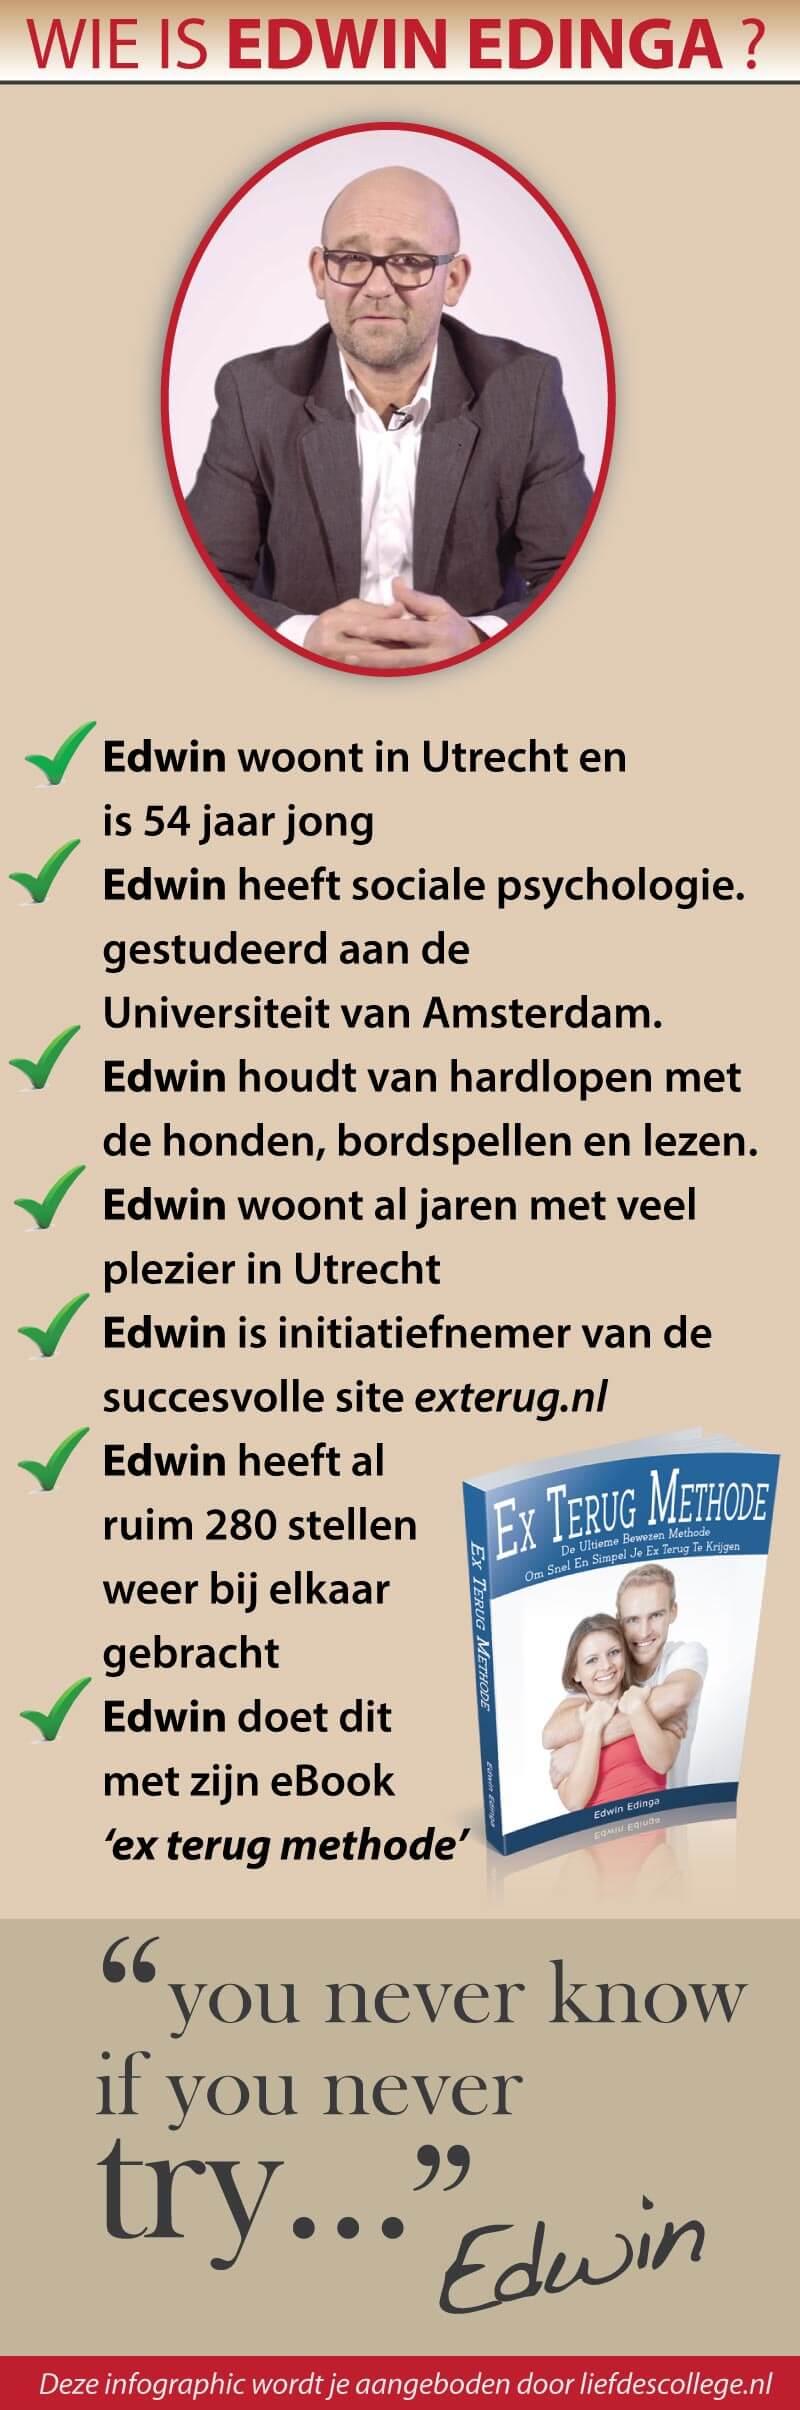 Edwin Edinga info